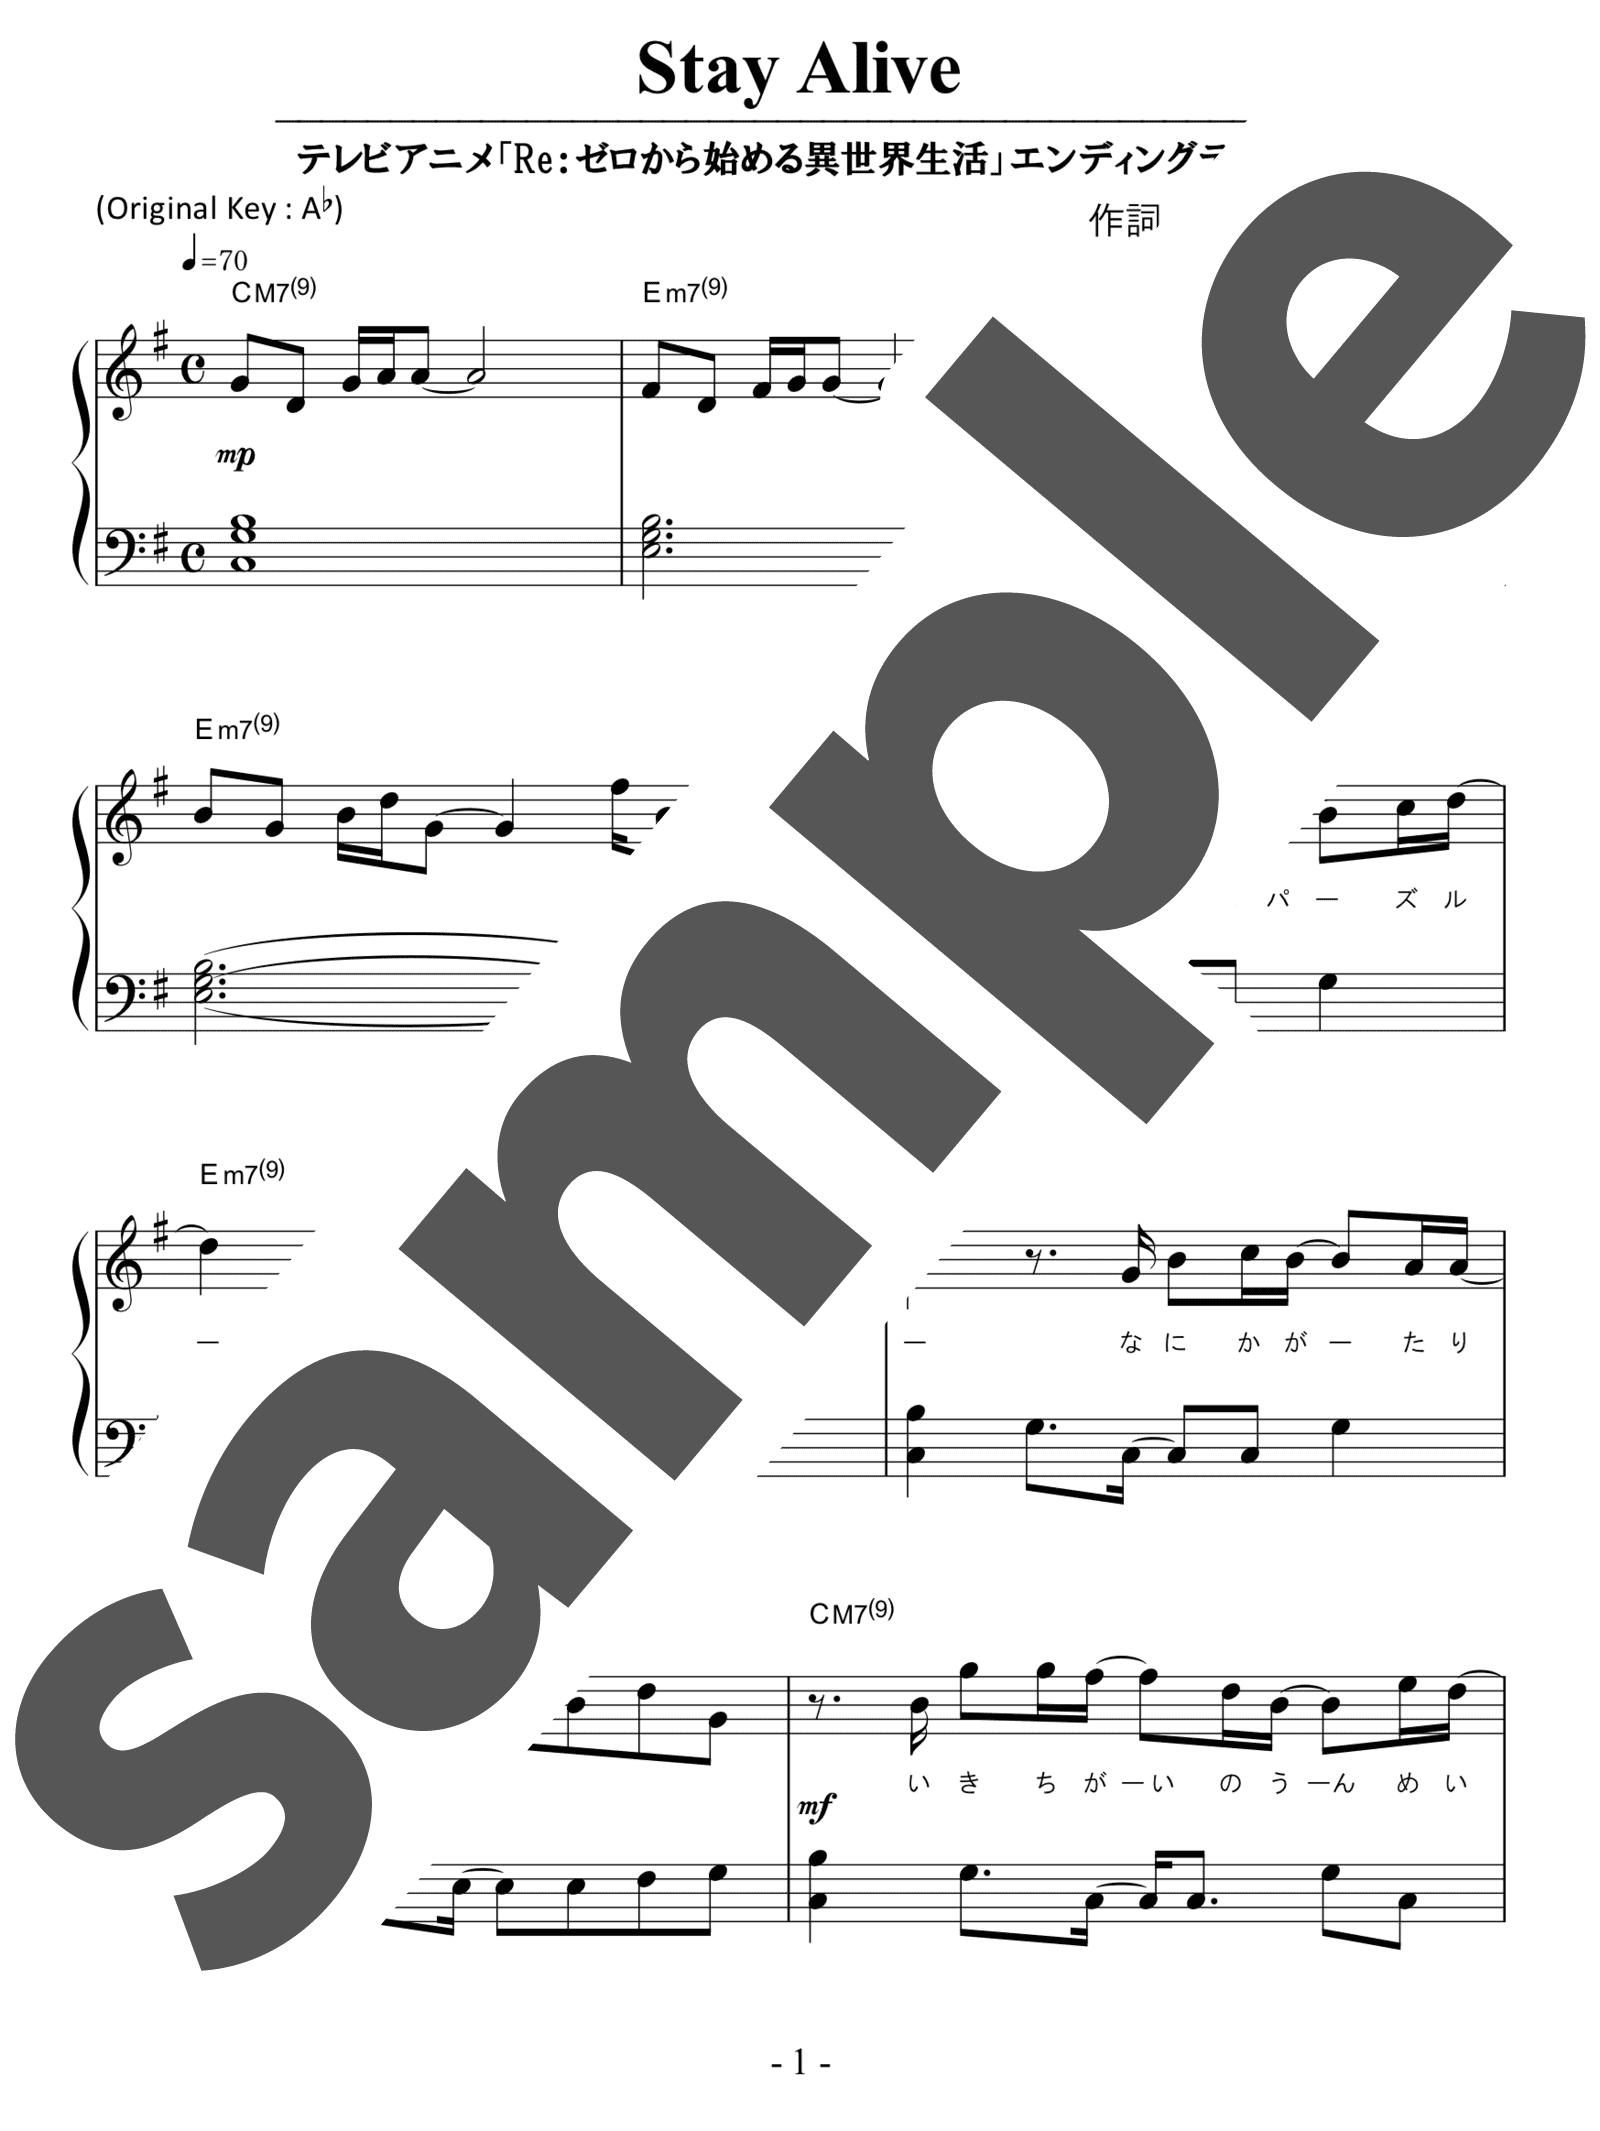 「Stay Alive」のサンプル楽譜